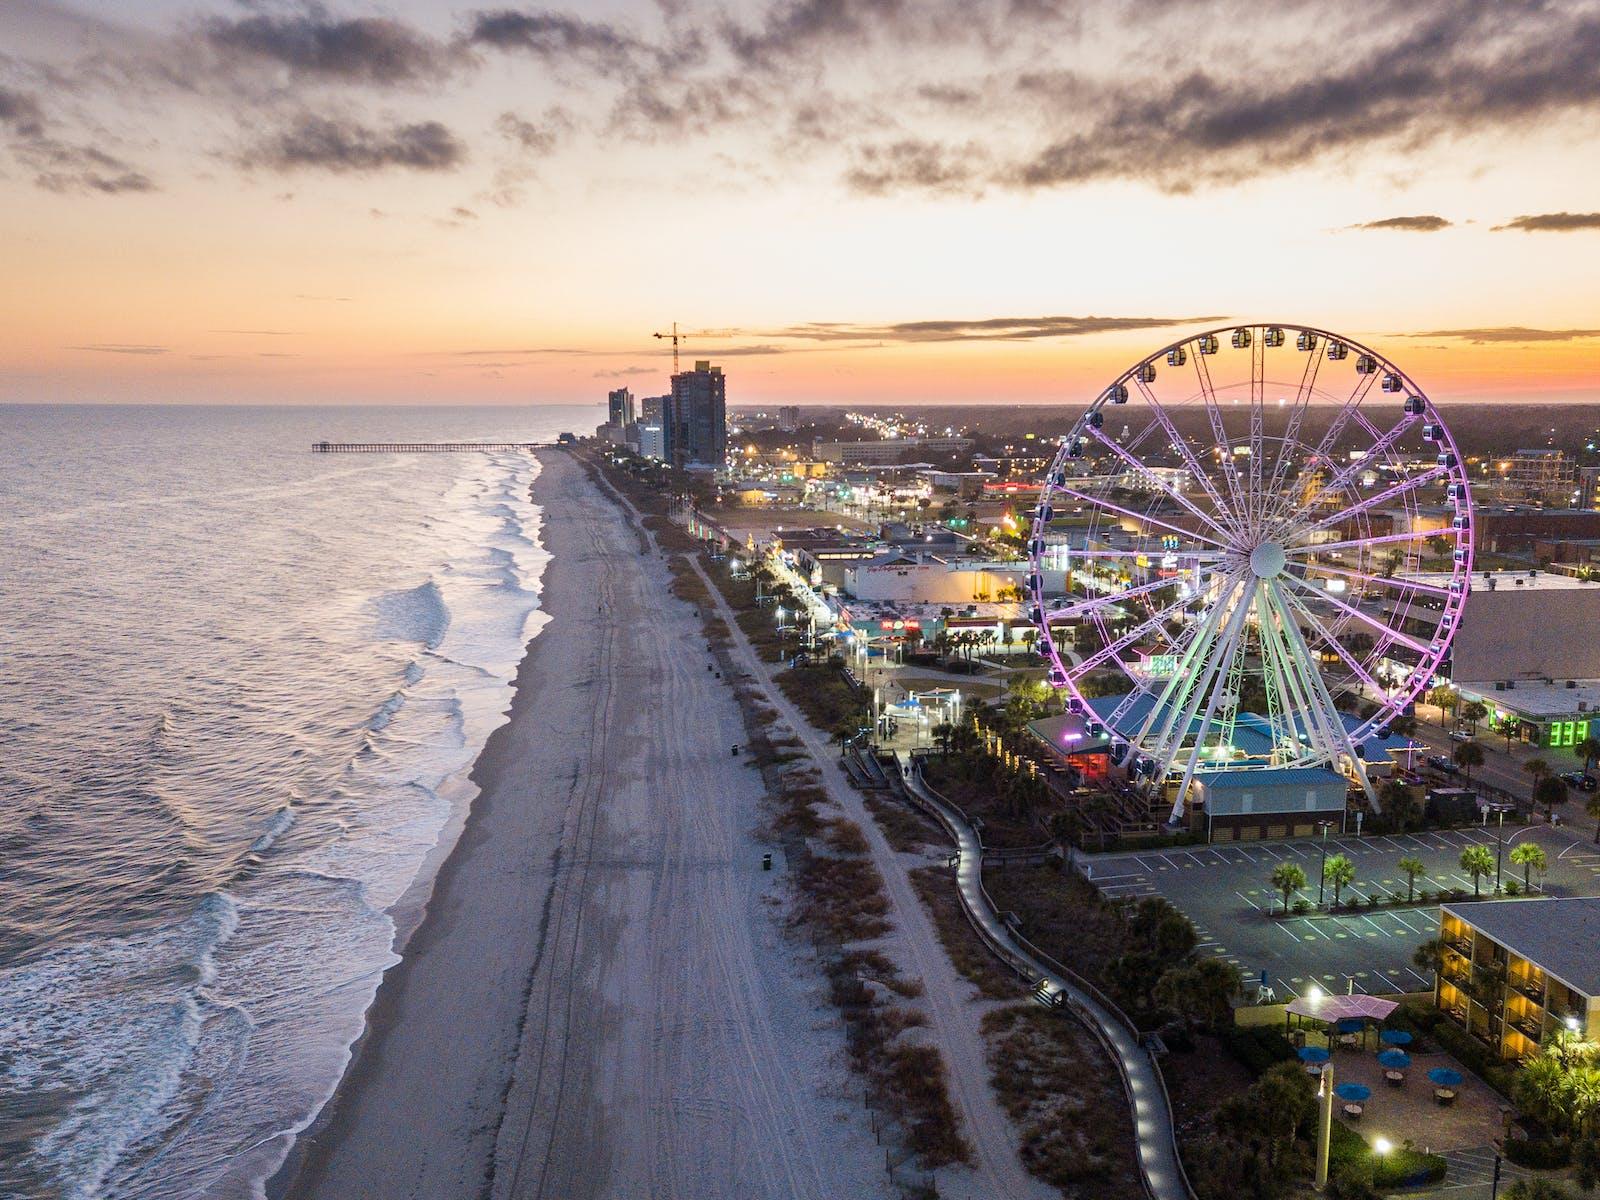 Aerial view of Myrtle Beach, SC with ocean waves, beach, boardwalk and ferris wheel